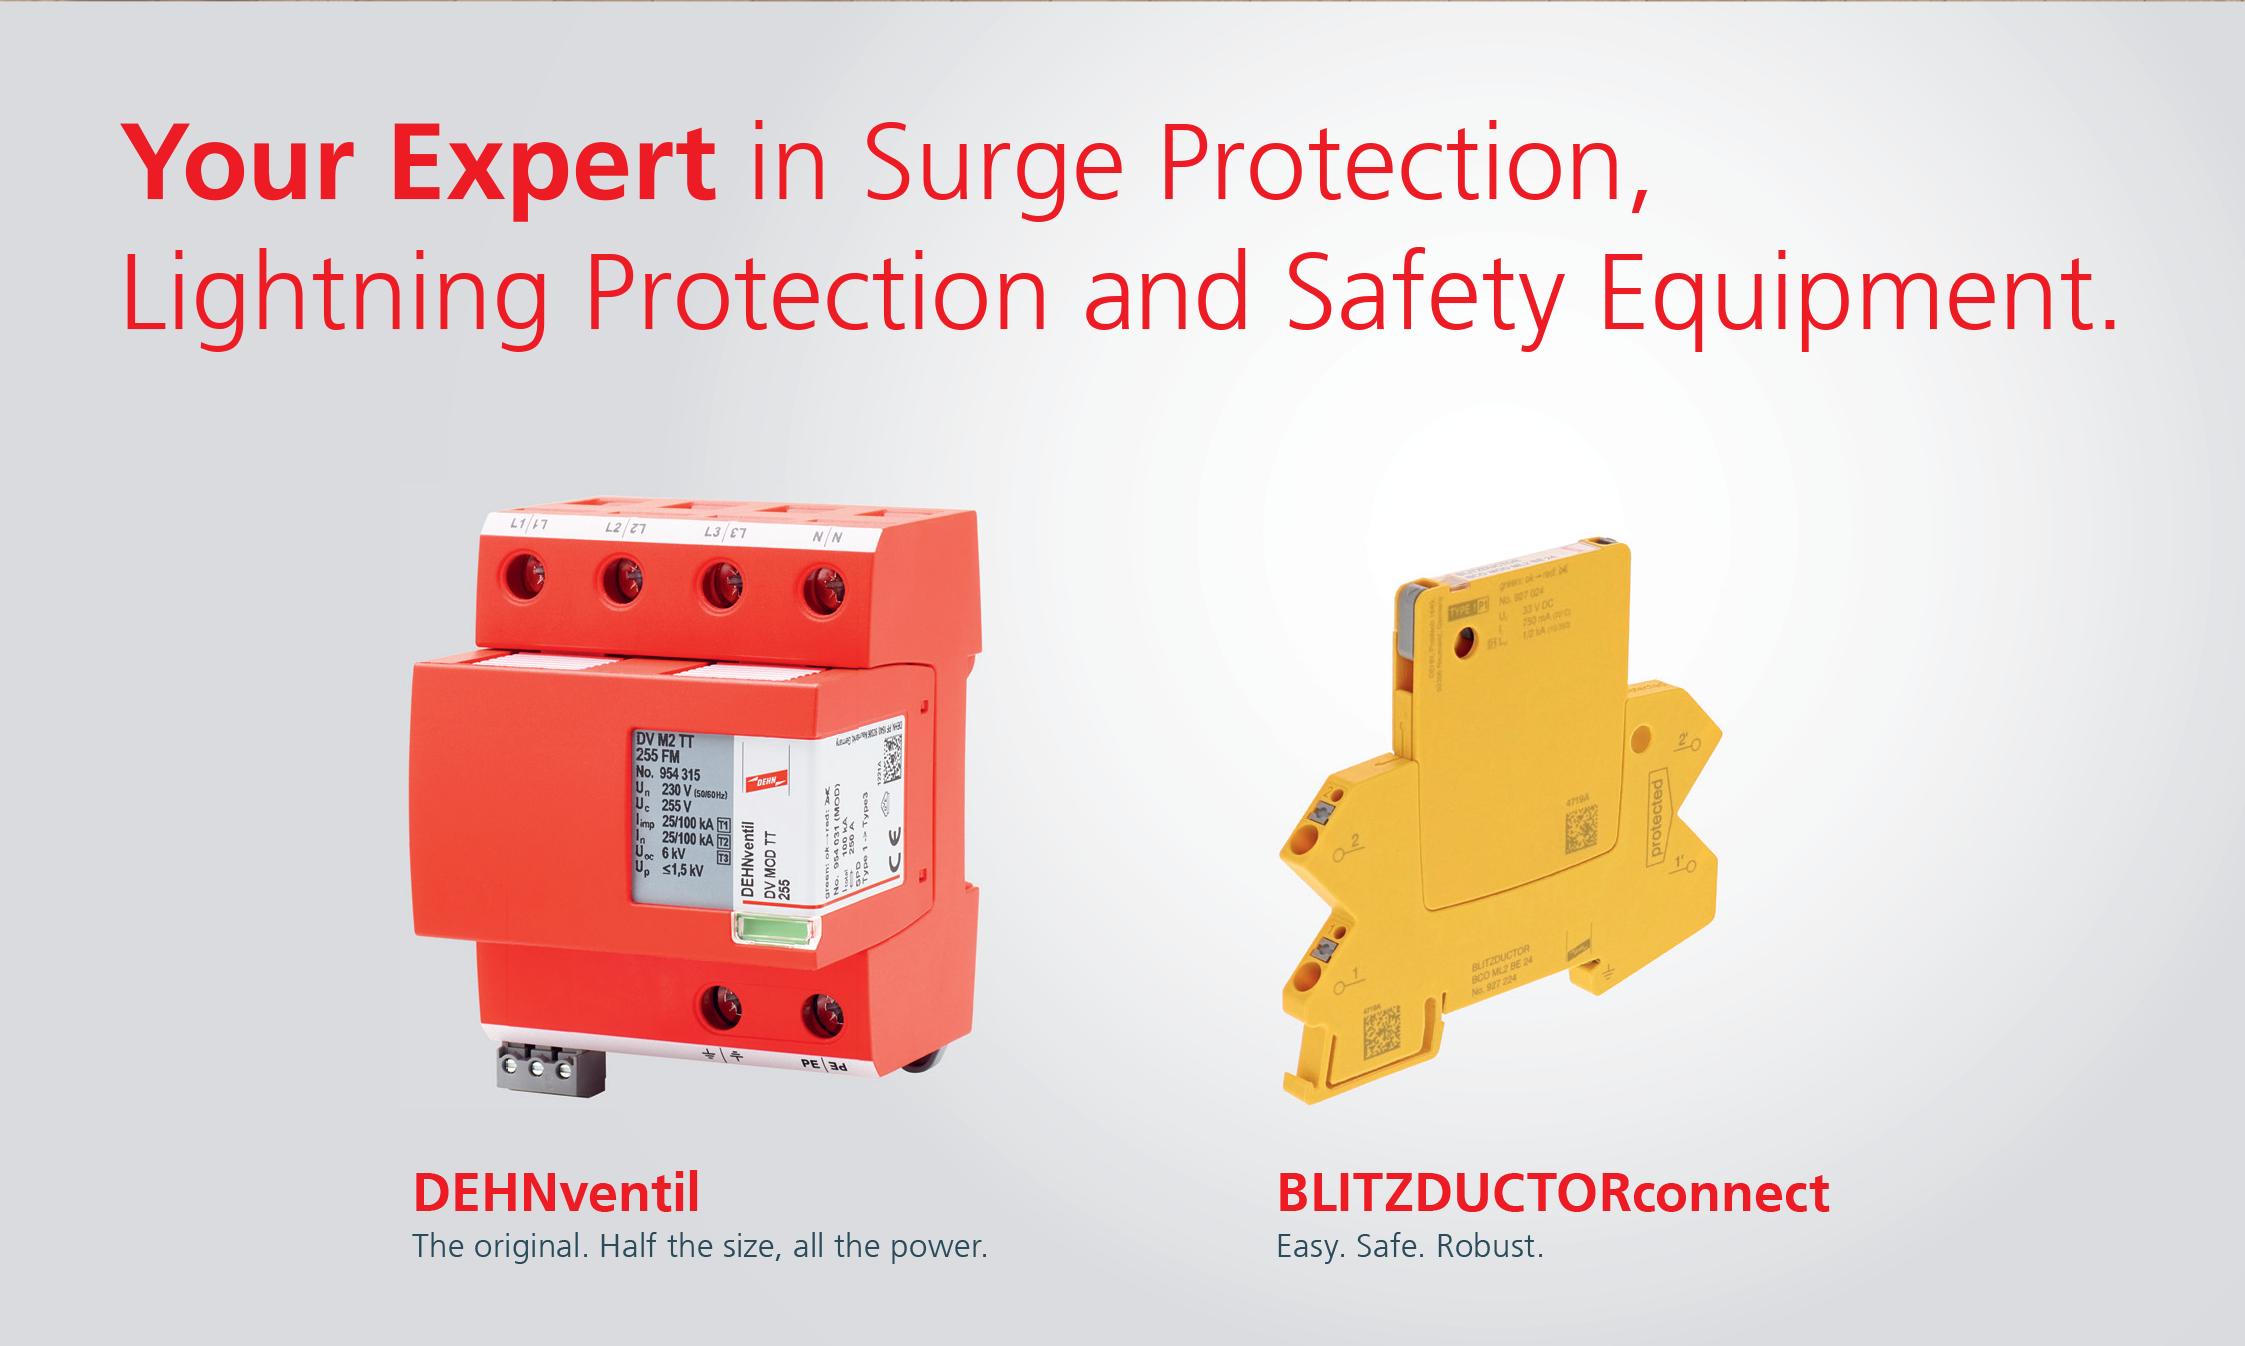 DEHNventil for Lightning & Surge Protection at Half the Size!